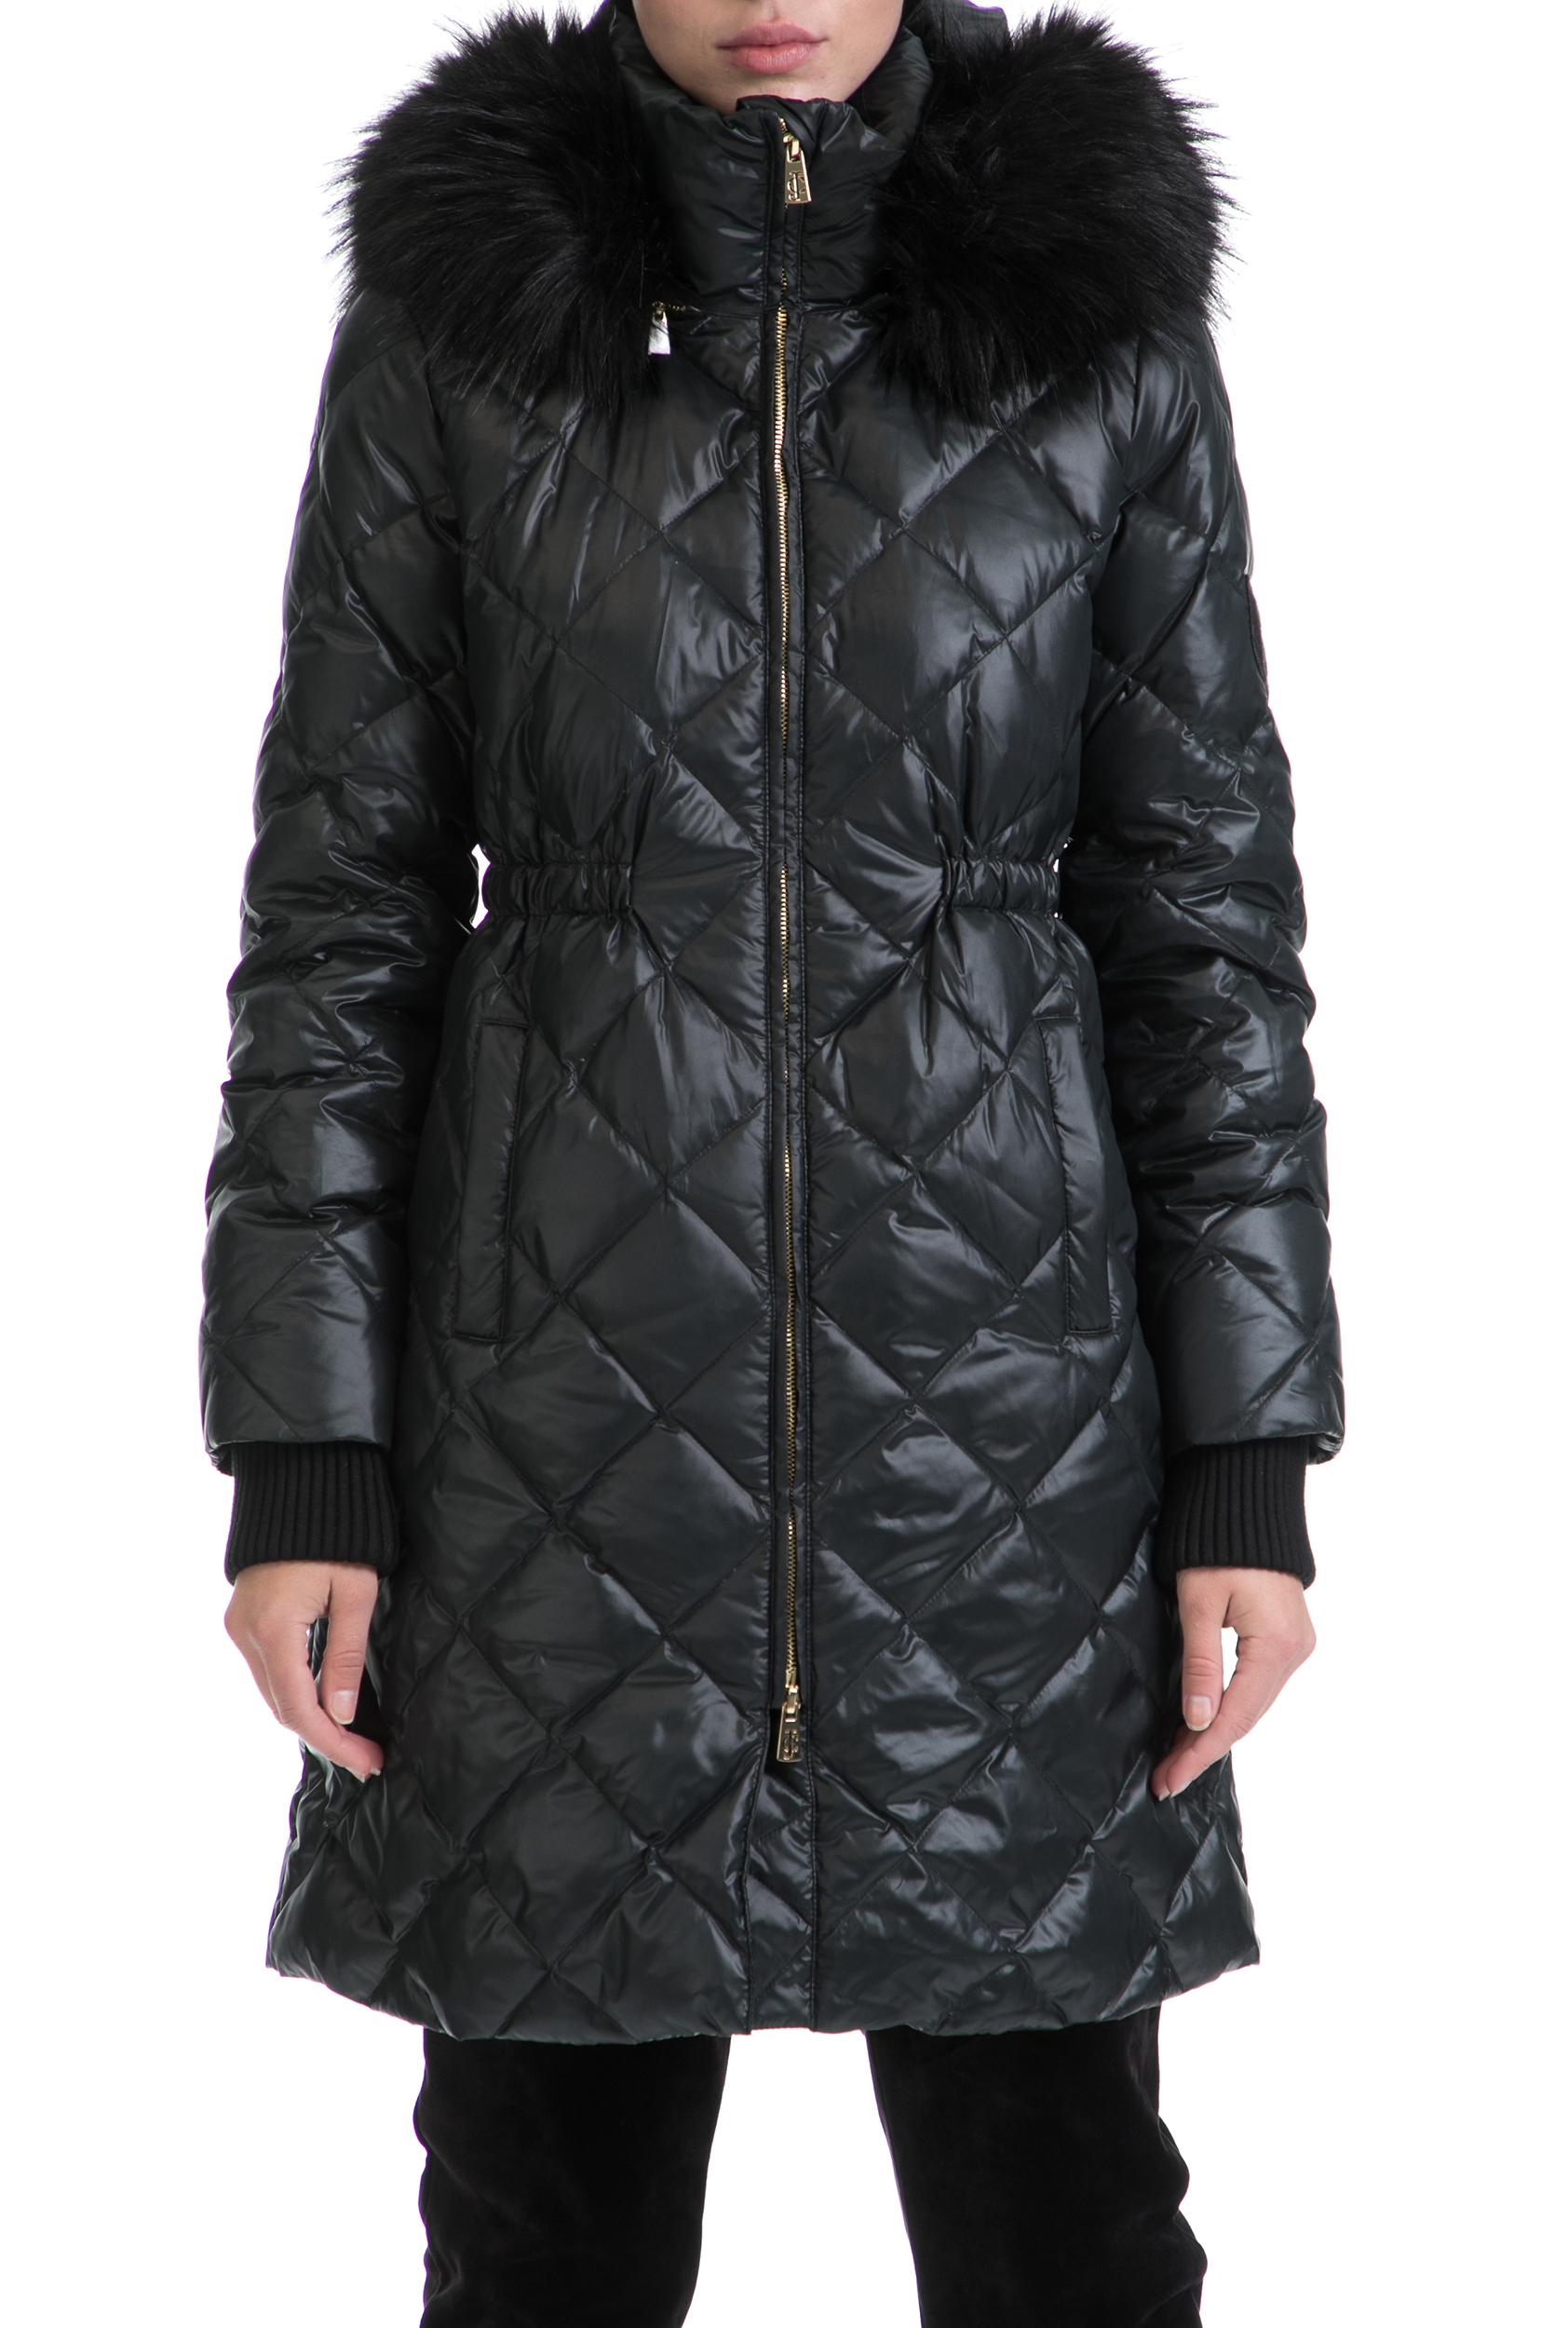 JUICY COUTURE - Γυναικείο μπουφάν JUICY COUTURE μαύρο γυναικεία ρούχα πανωφόρια μπουφάν